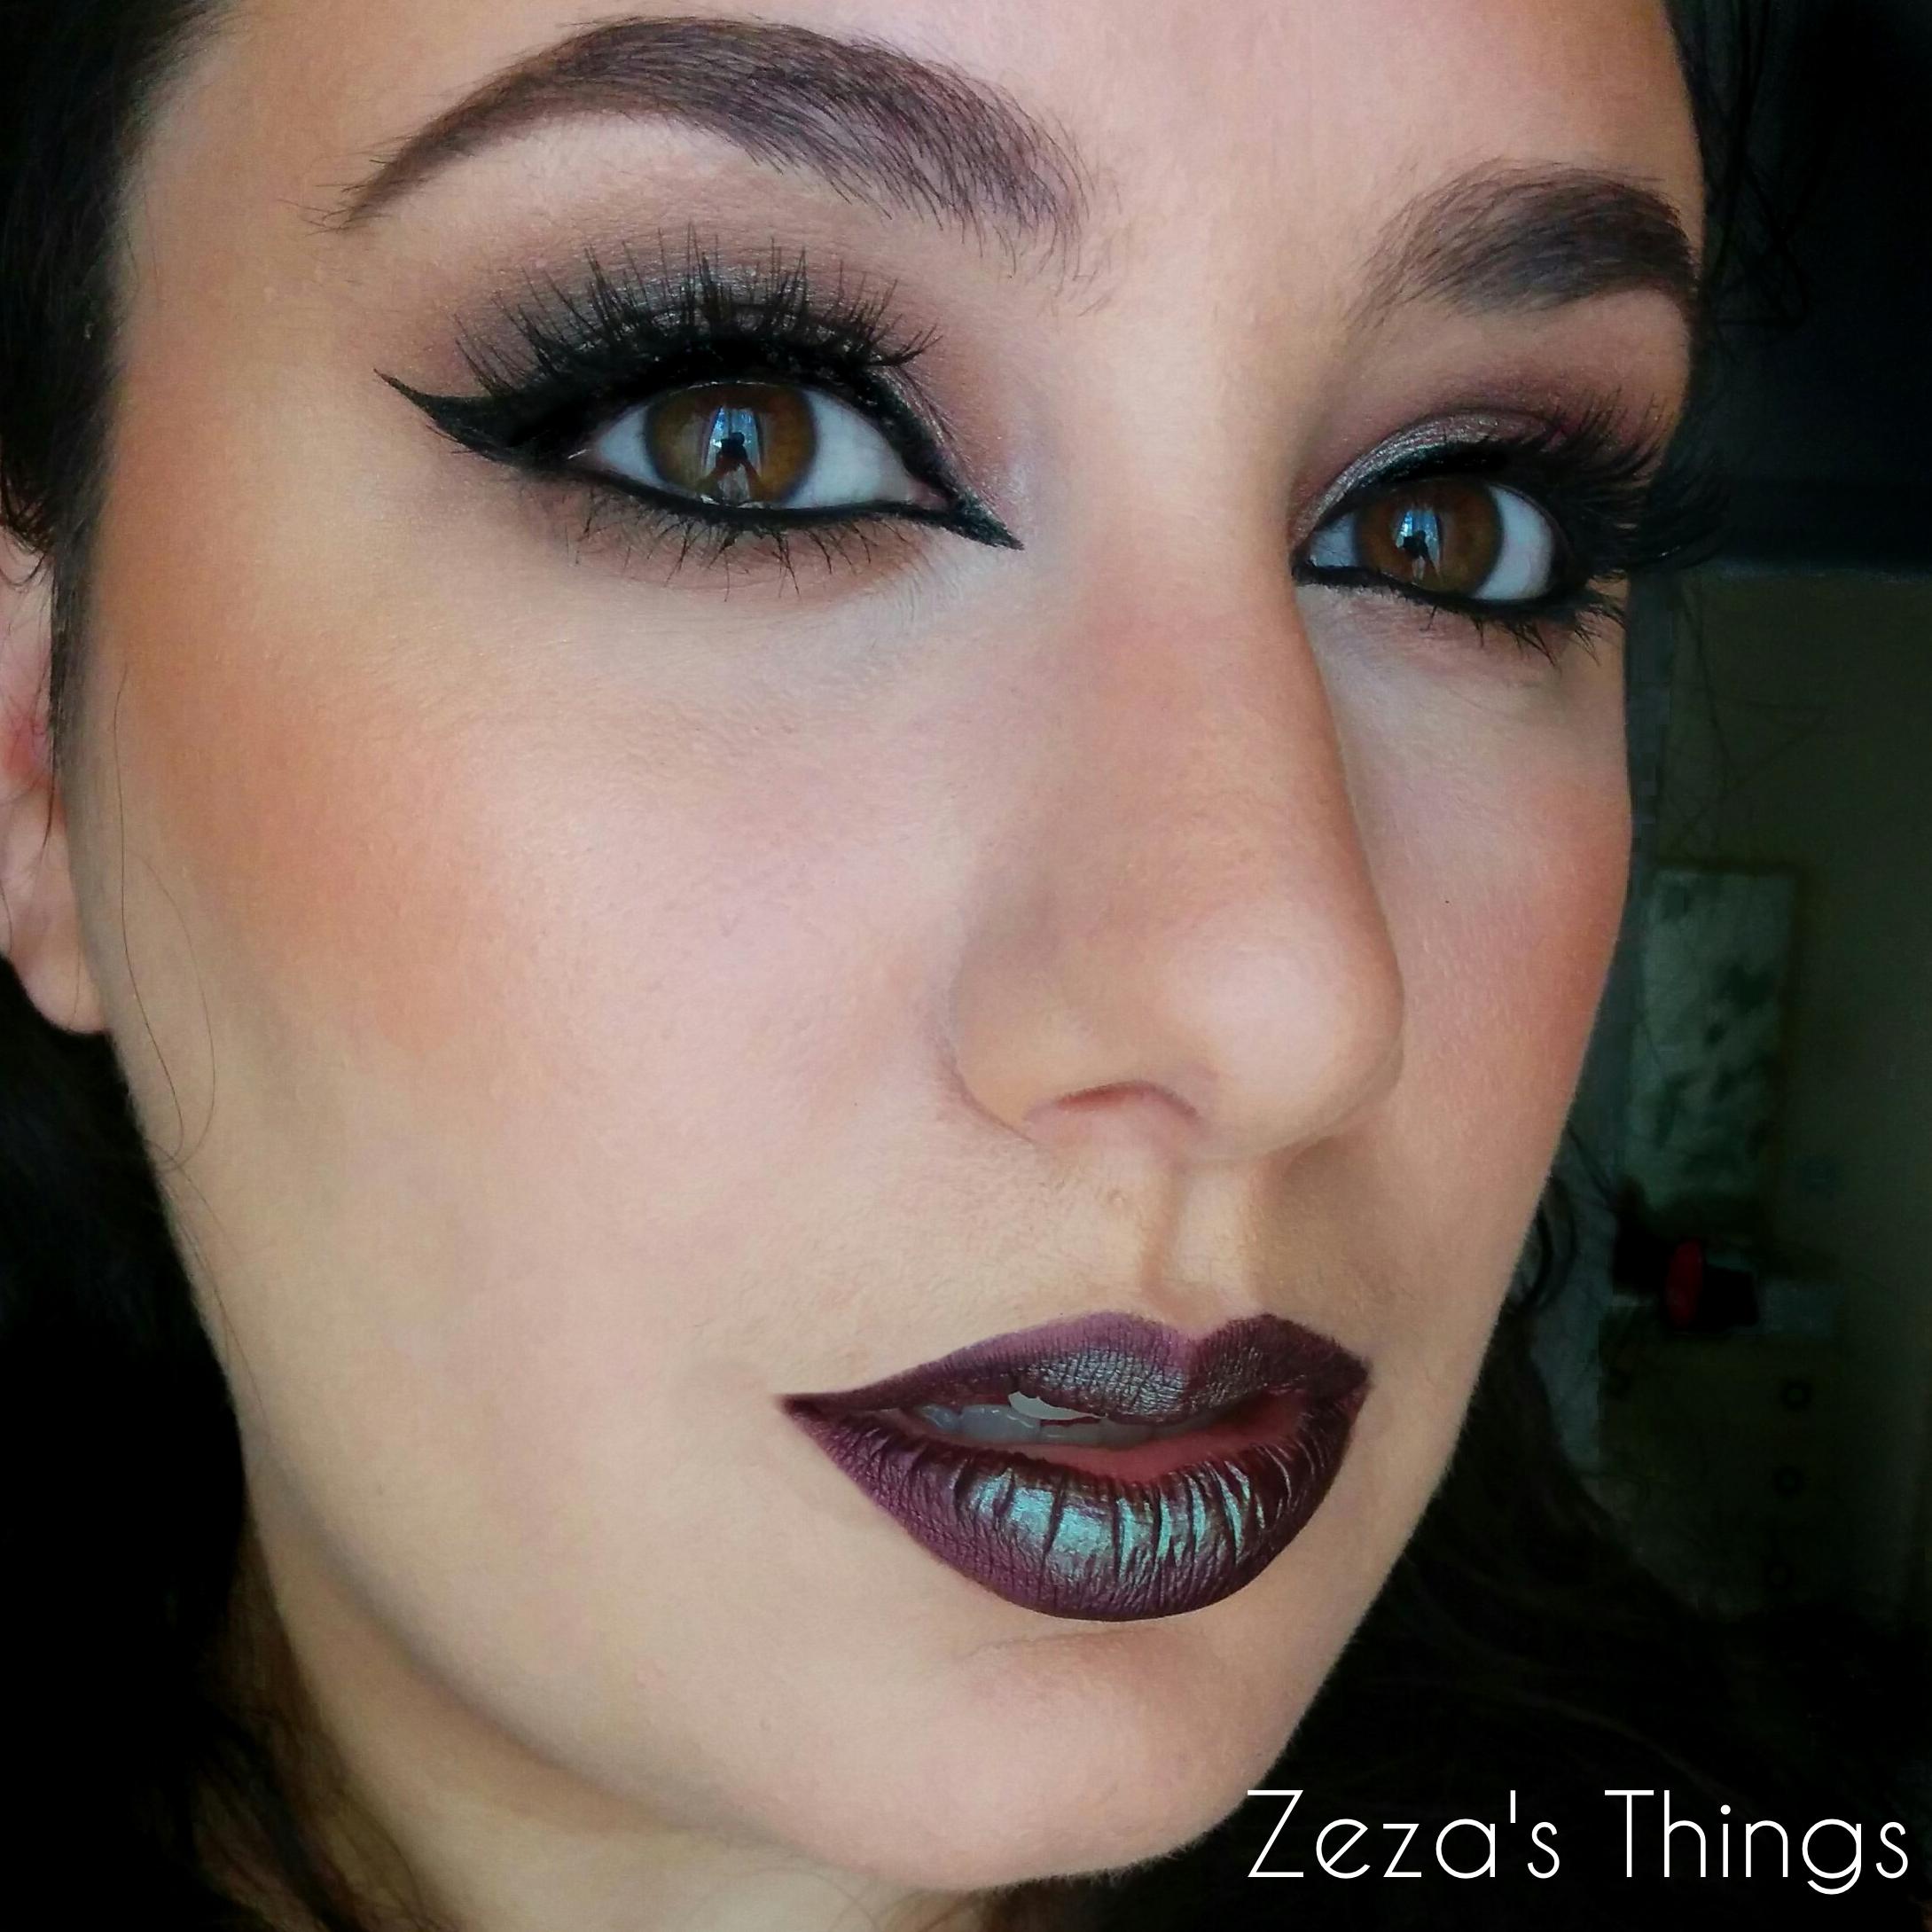 Wearable Halloween Look Using Makeup Geeku2019s Insomnia Pigment | Zezau0026#39;s Things